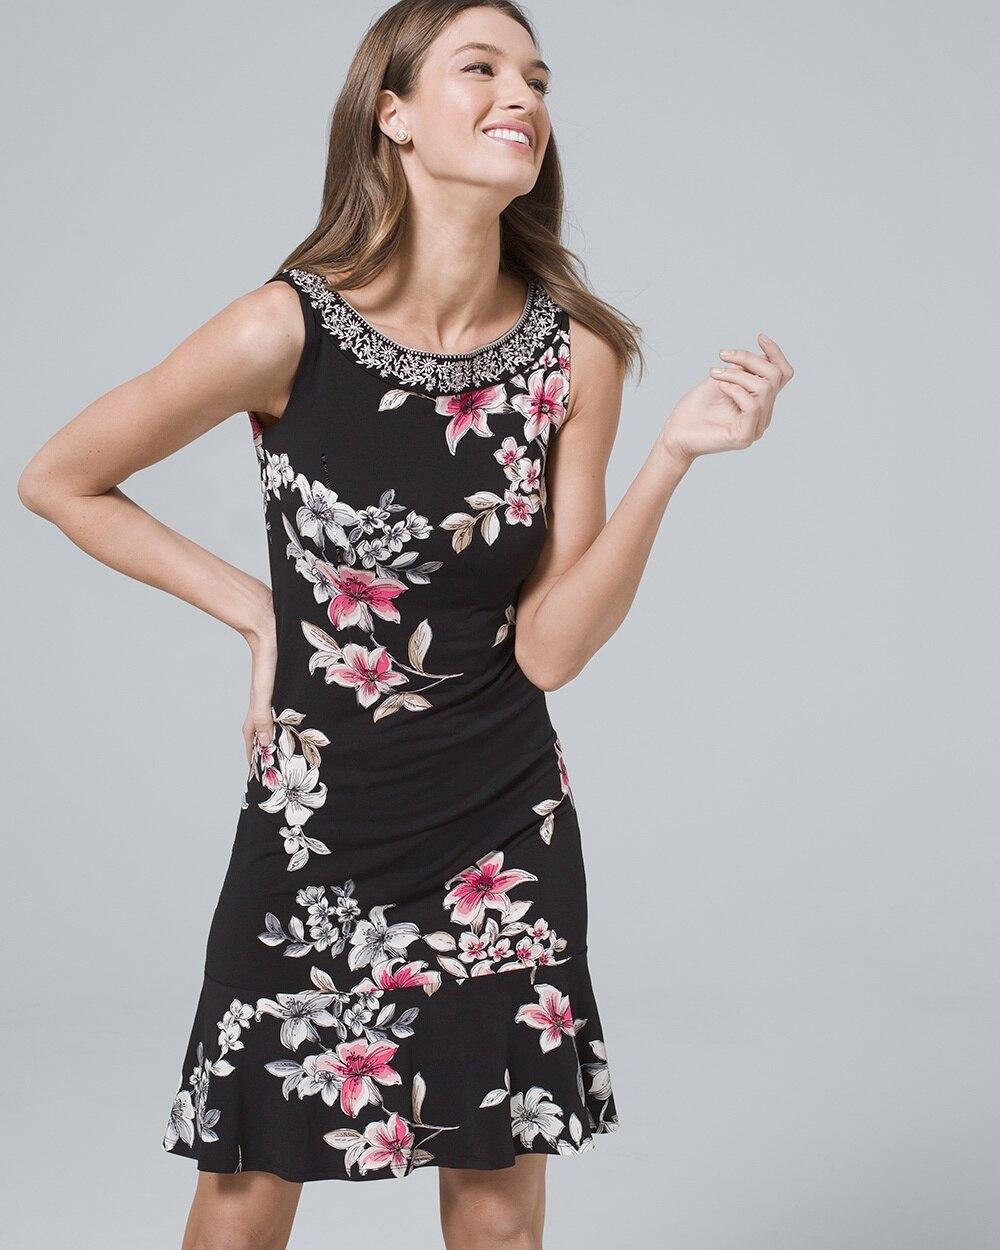 dbe072114b1 Polished Knit Embellished Flounce-Hem Floral Shift Dress - White House  Black Market